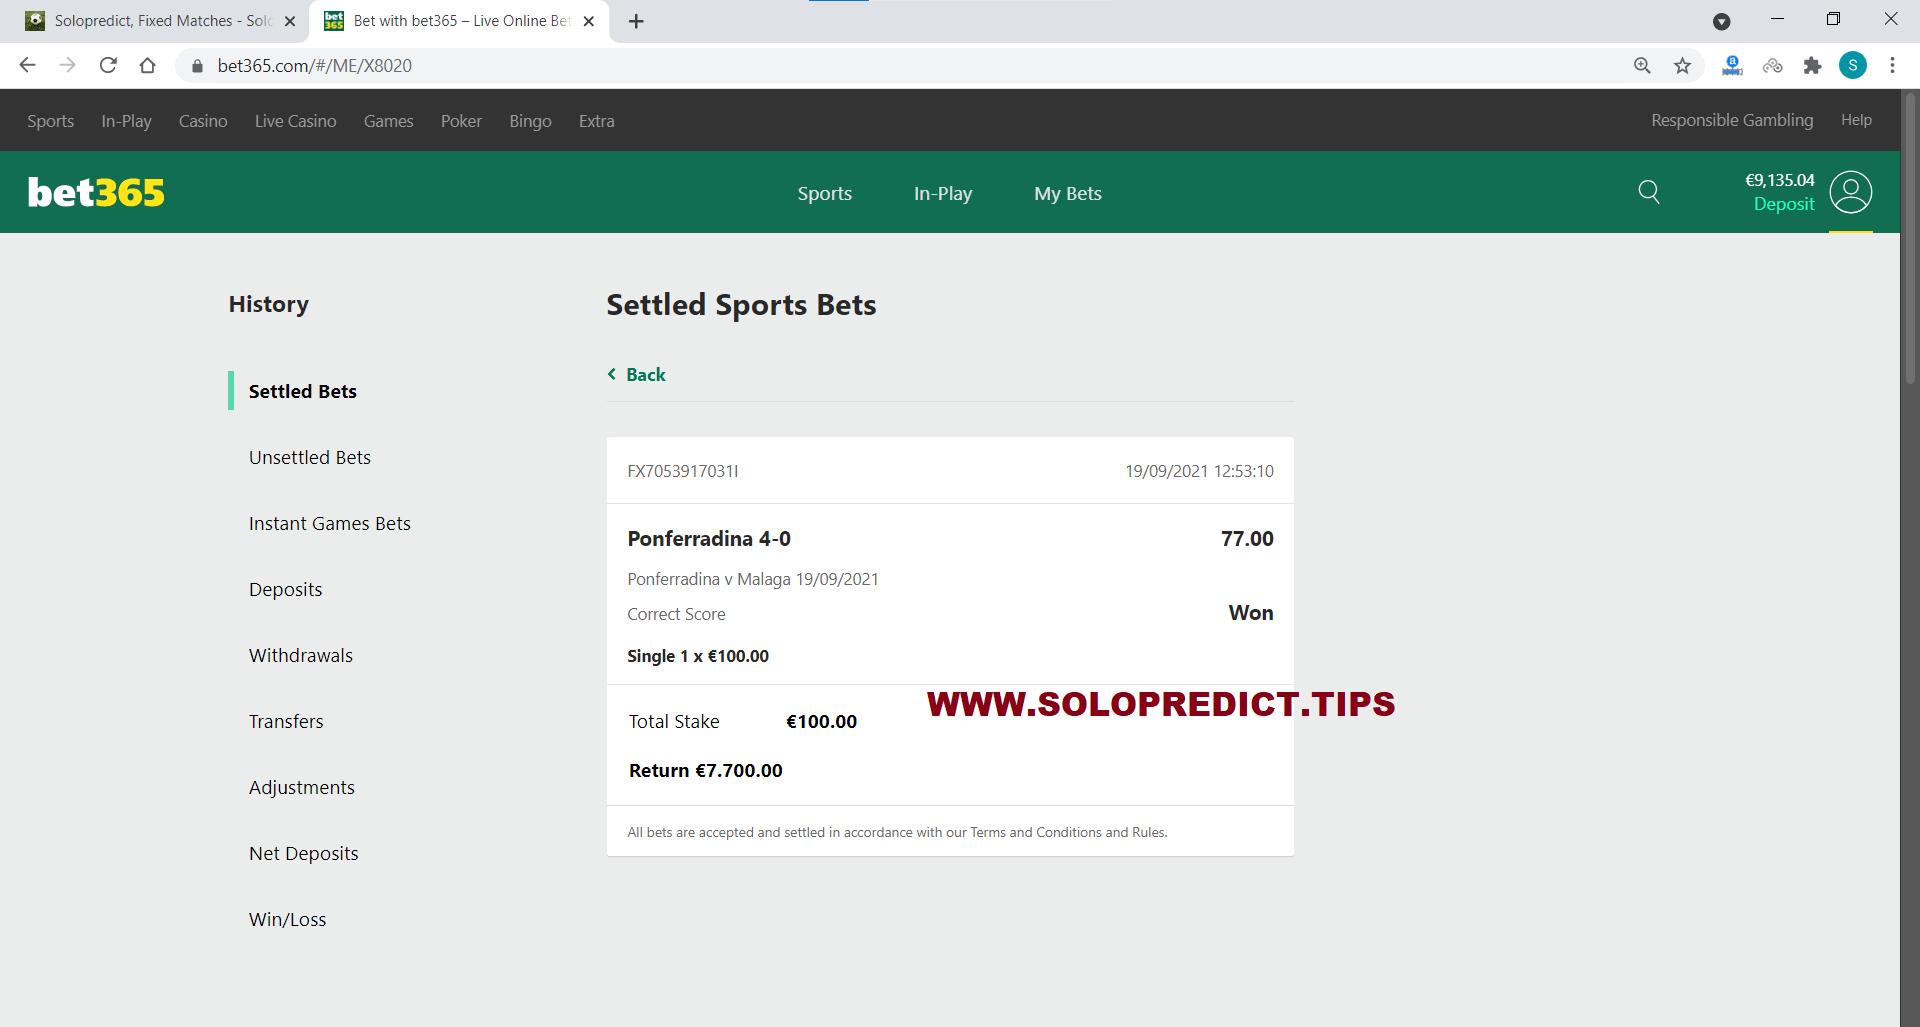 solopredict correct score fixed matches won 19 09